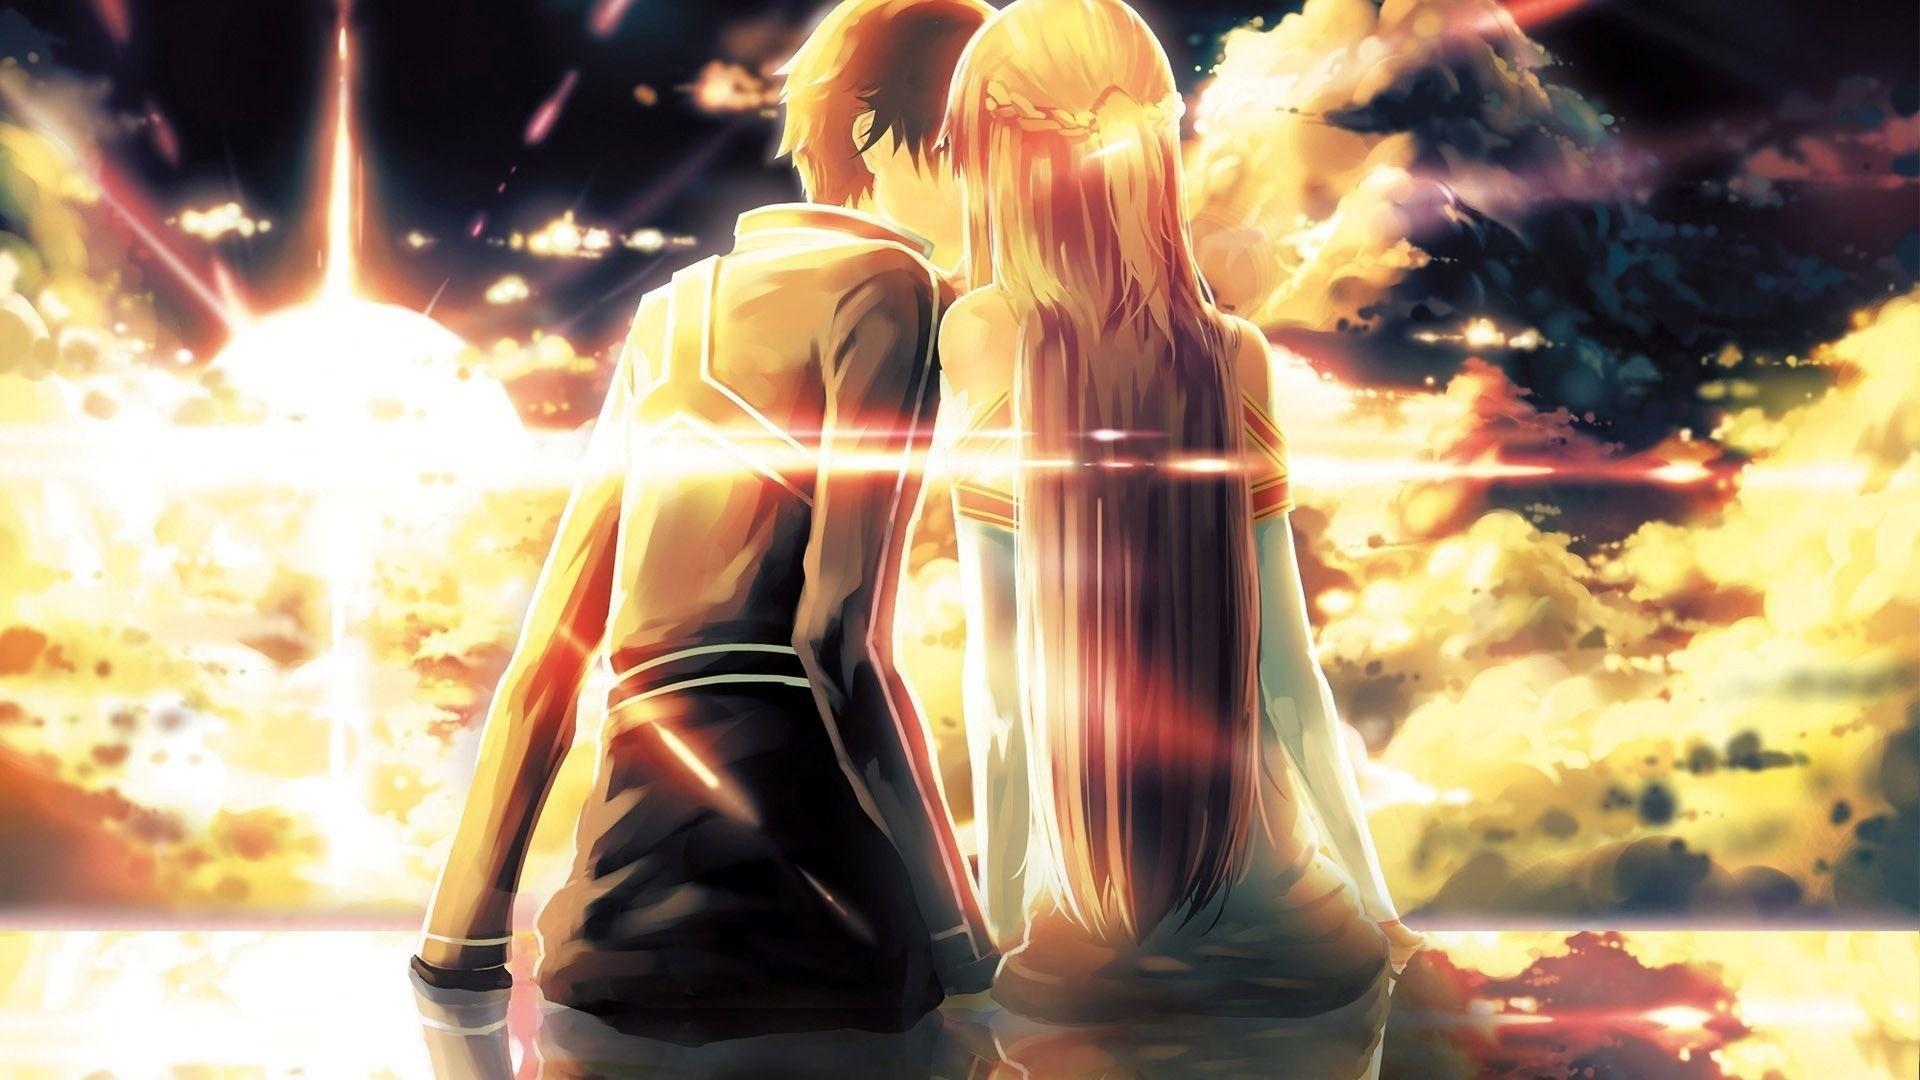 Hd Anime Couple Wallpapers No 1 Wallpaper Hd